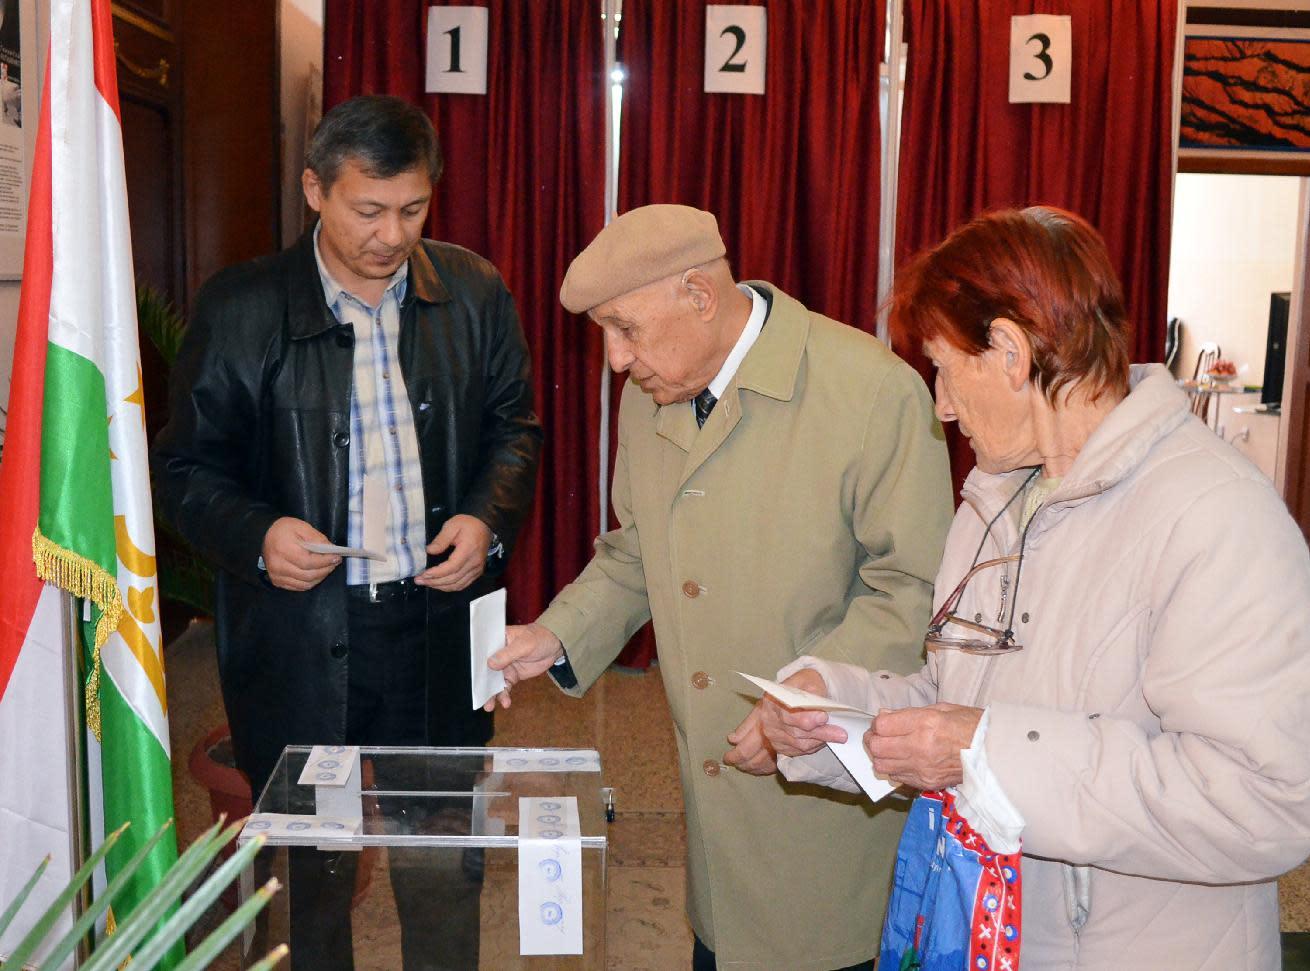 Tajik people vote at a polling station in Dushanbe, on November 6, 2013 (AFP Photo/)